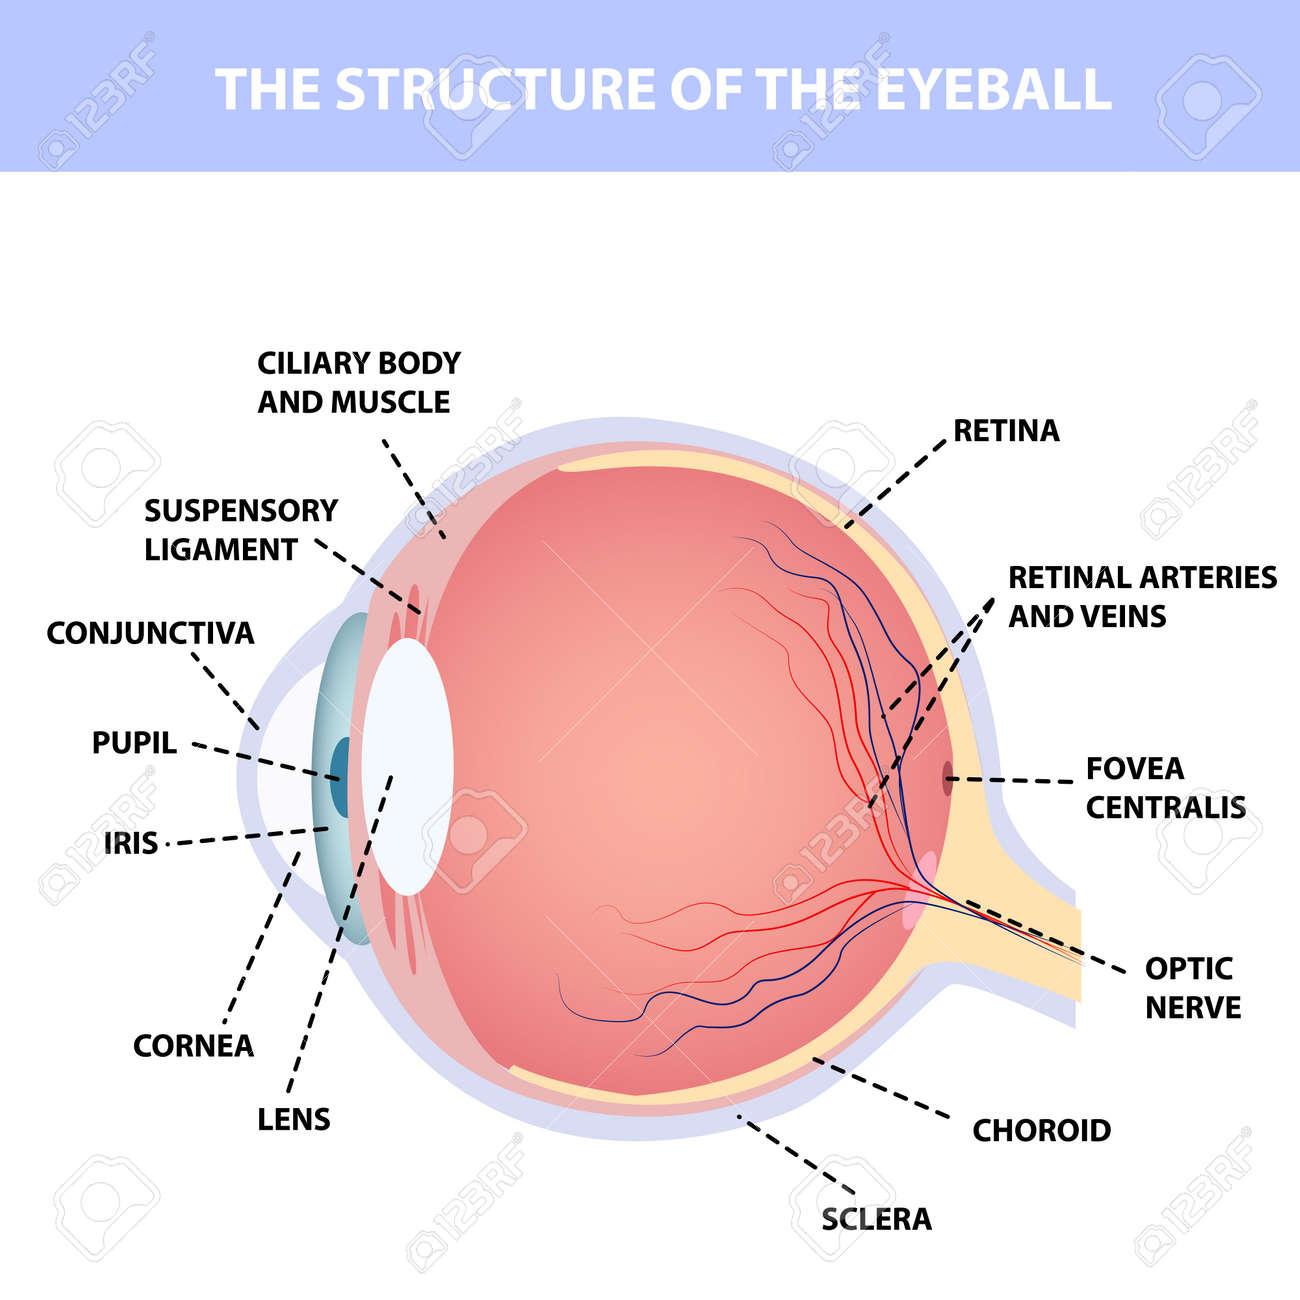 Human eye anatomy, designation, for poster or teaching material medical illustration - 152191325